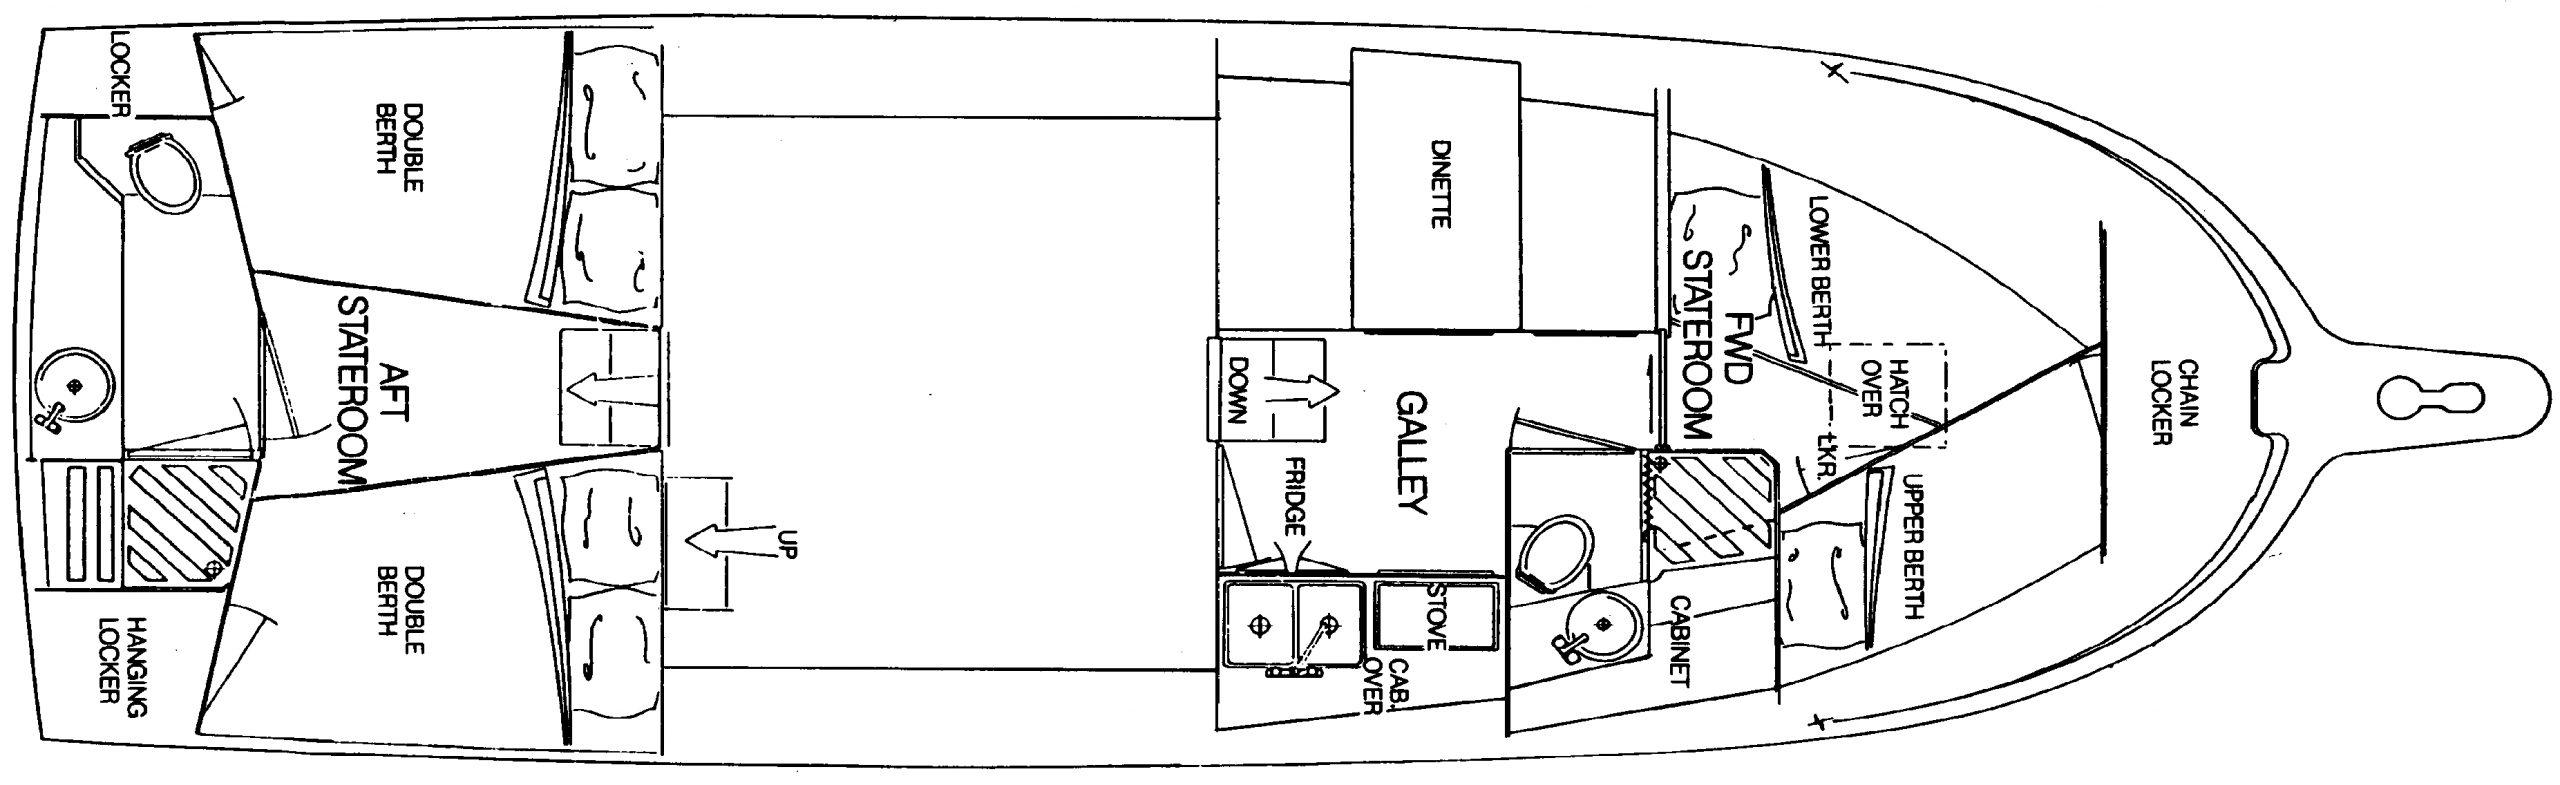 35 Motor Yacht Floor Plan 1